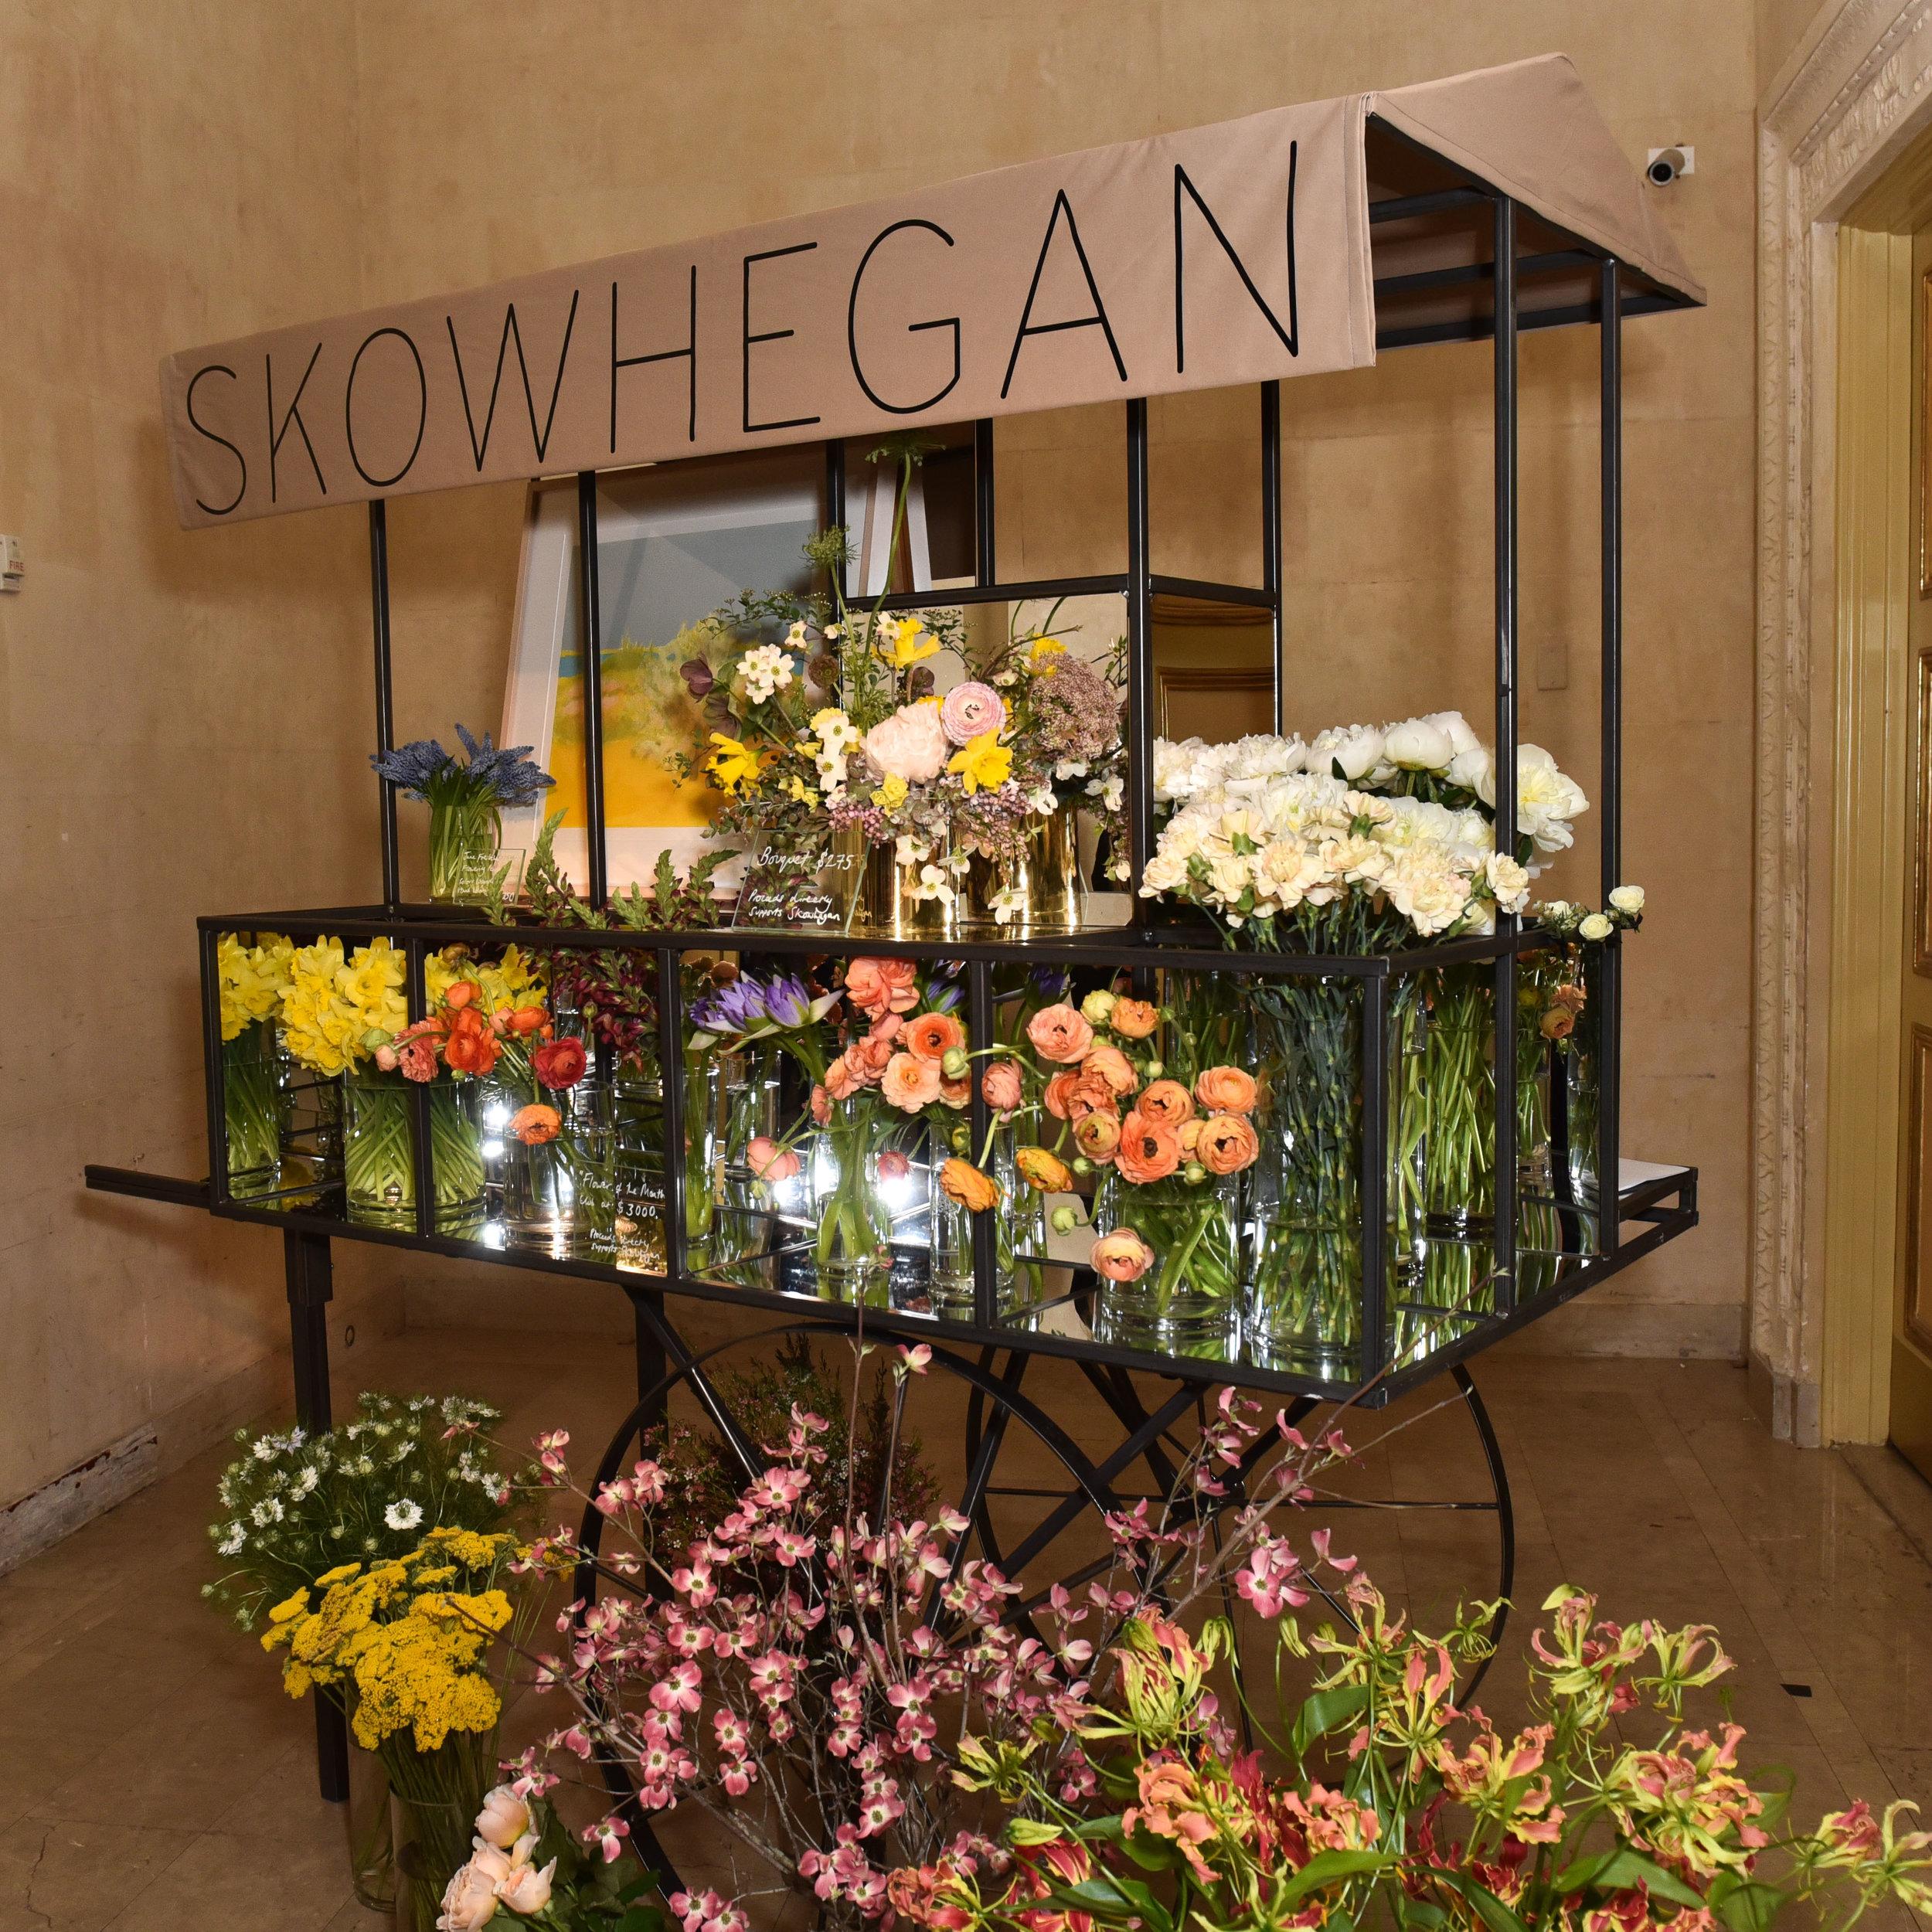 Skowhegan Flower Cart by Saipua